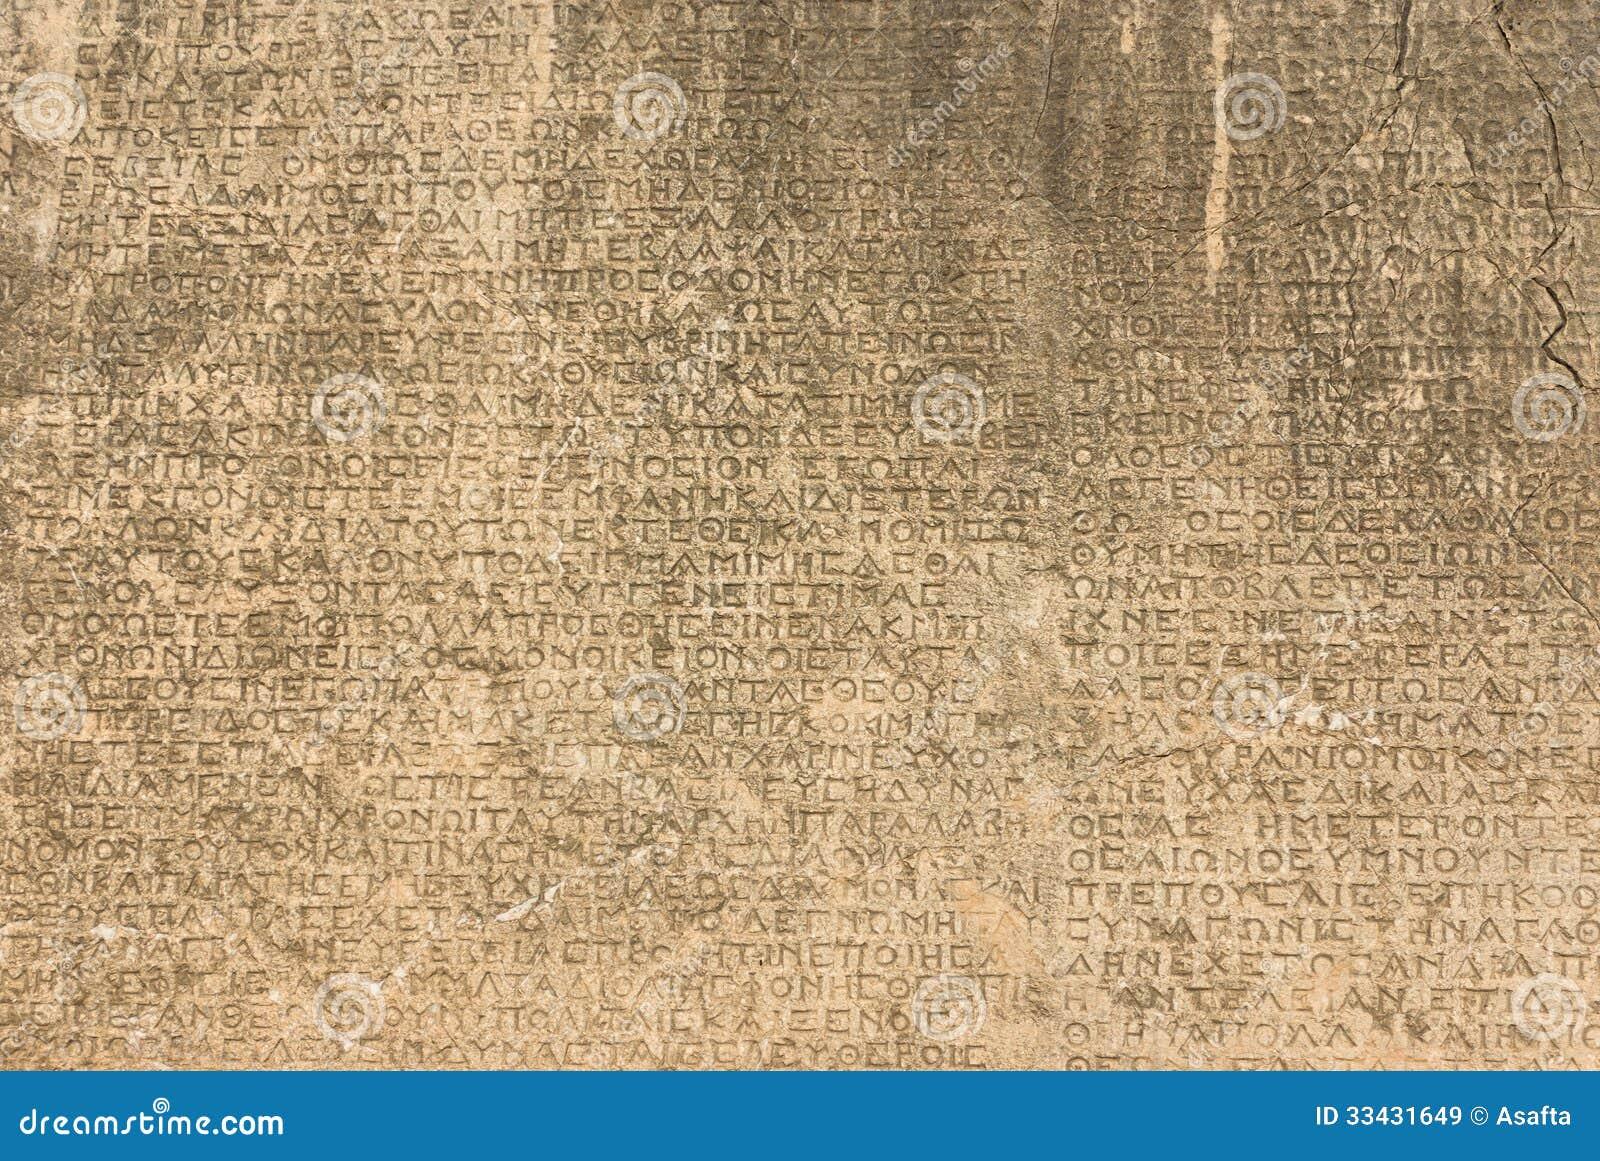 Greek Alphabet Stock Image Image Of Background Culture